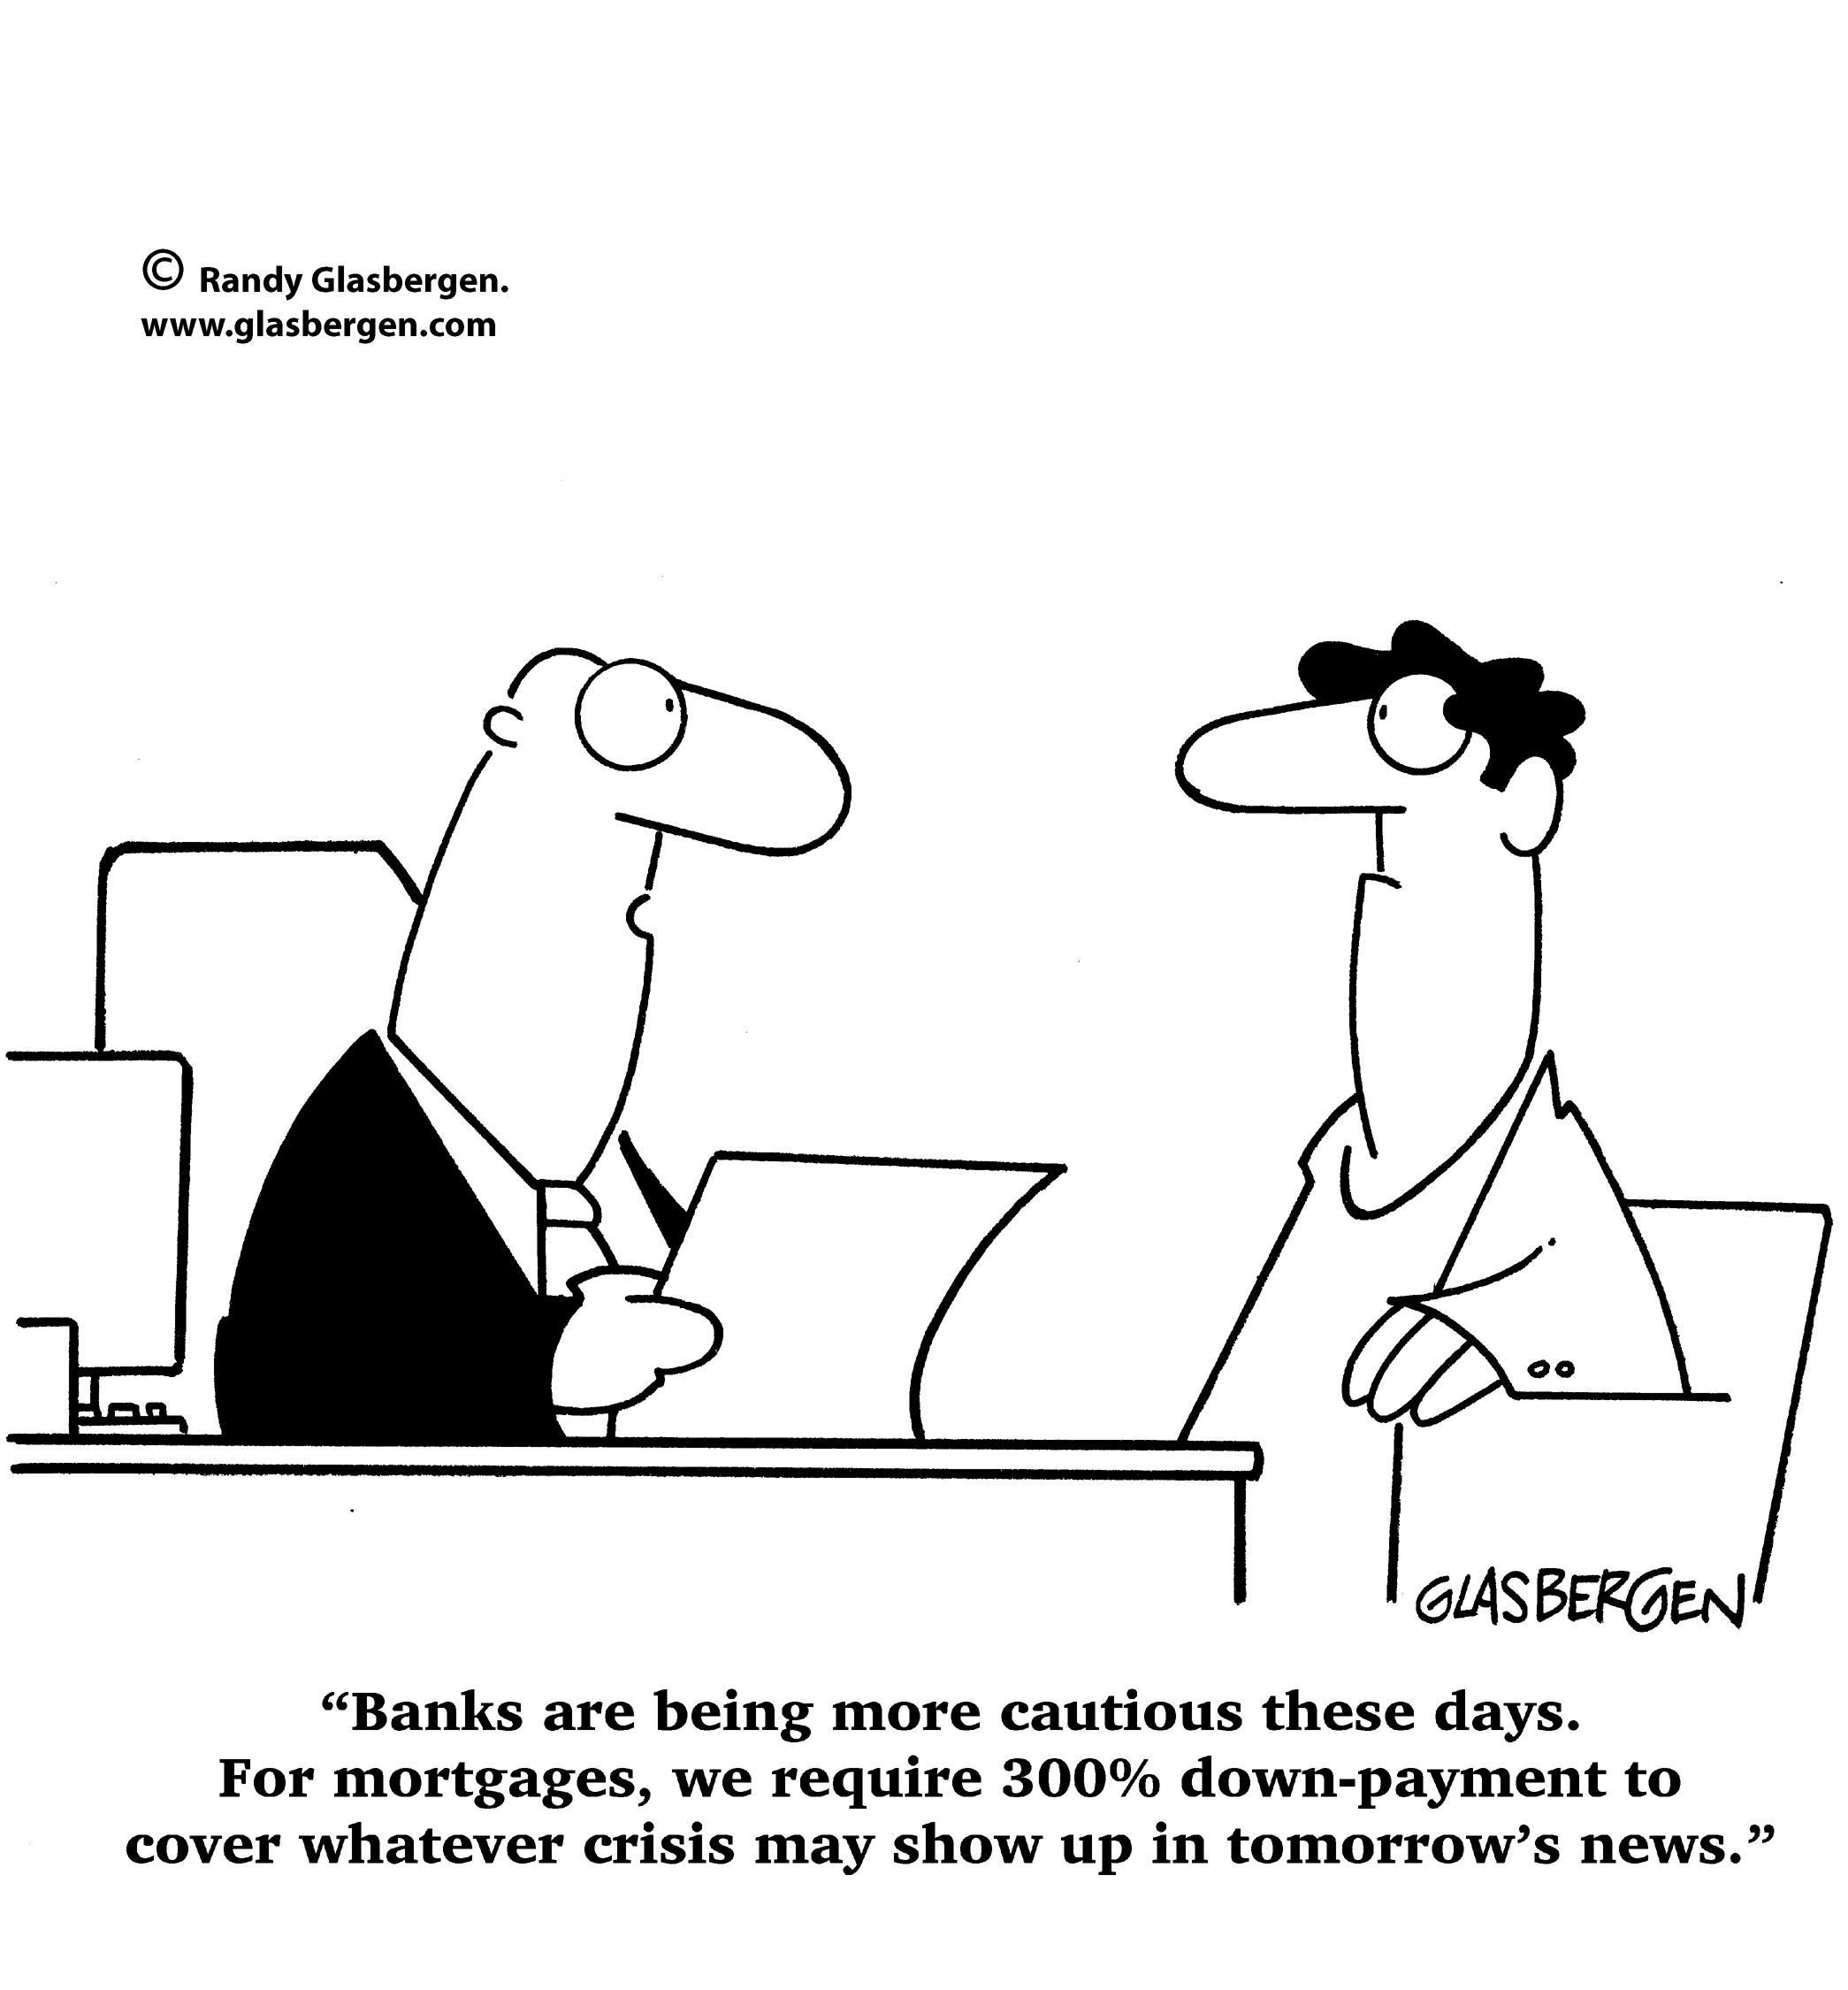 Cautious Banks